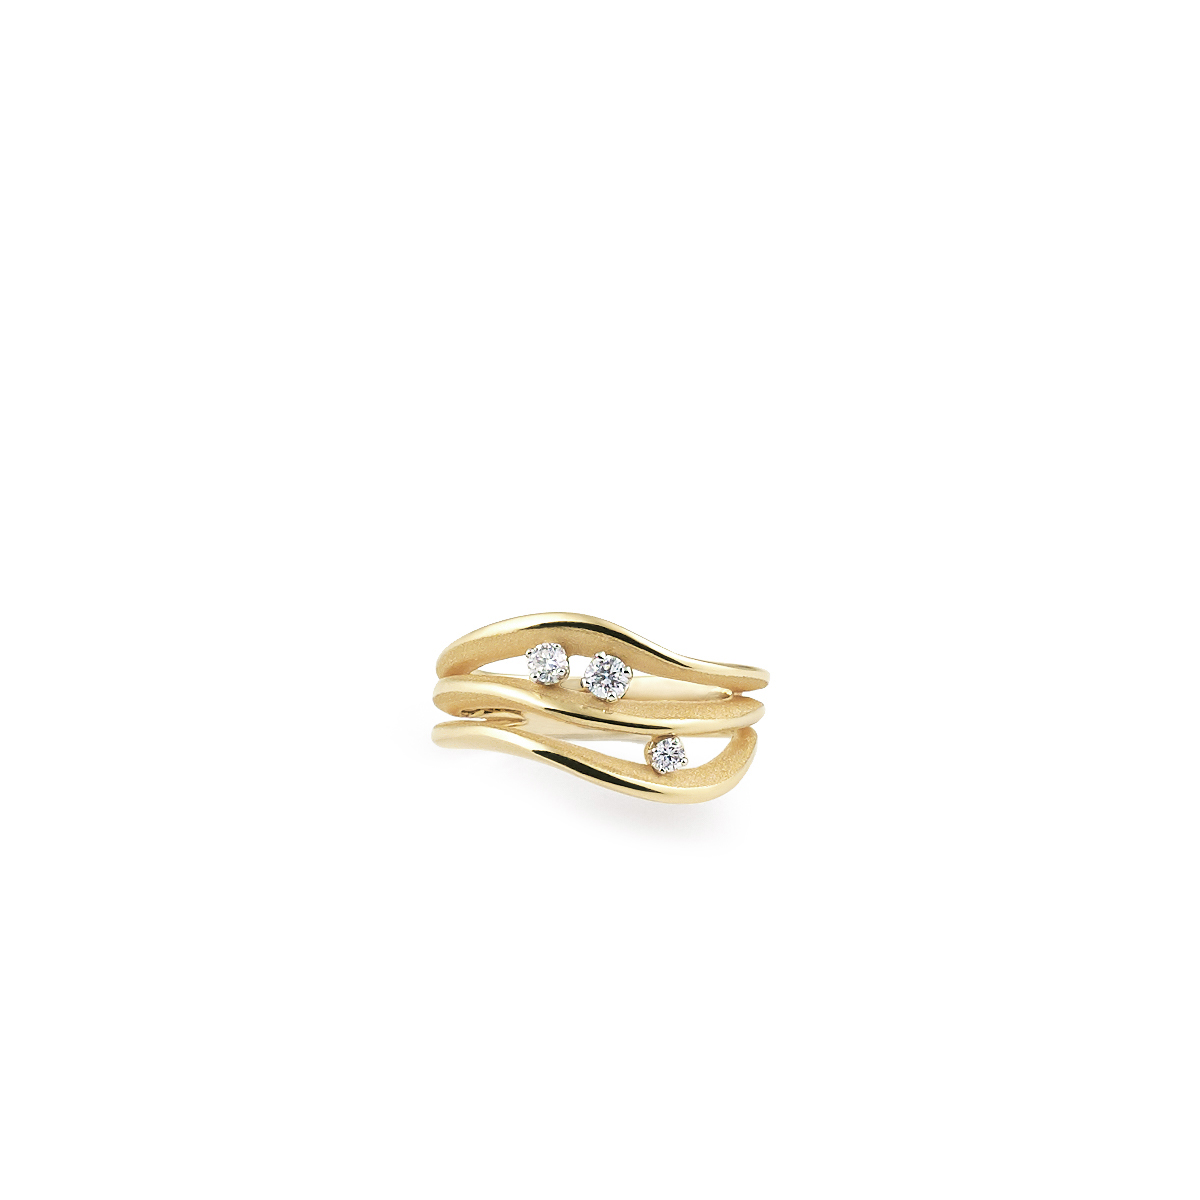 Anna Maria Cammilli 18ct Yellow Gold And Diamond Luxor Sunrise Multi Strand Ring.